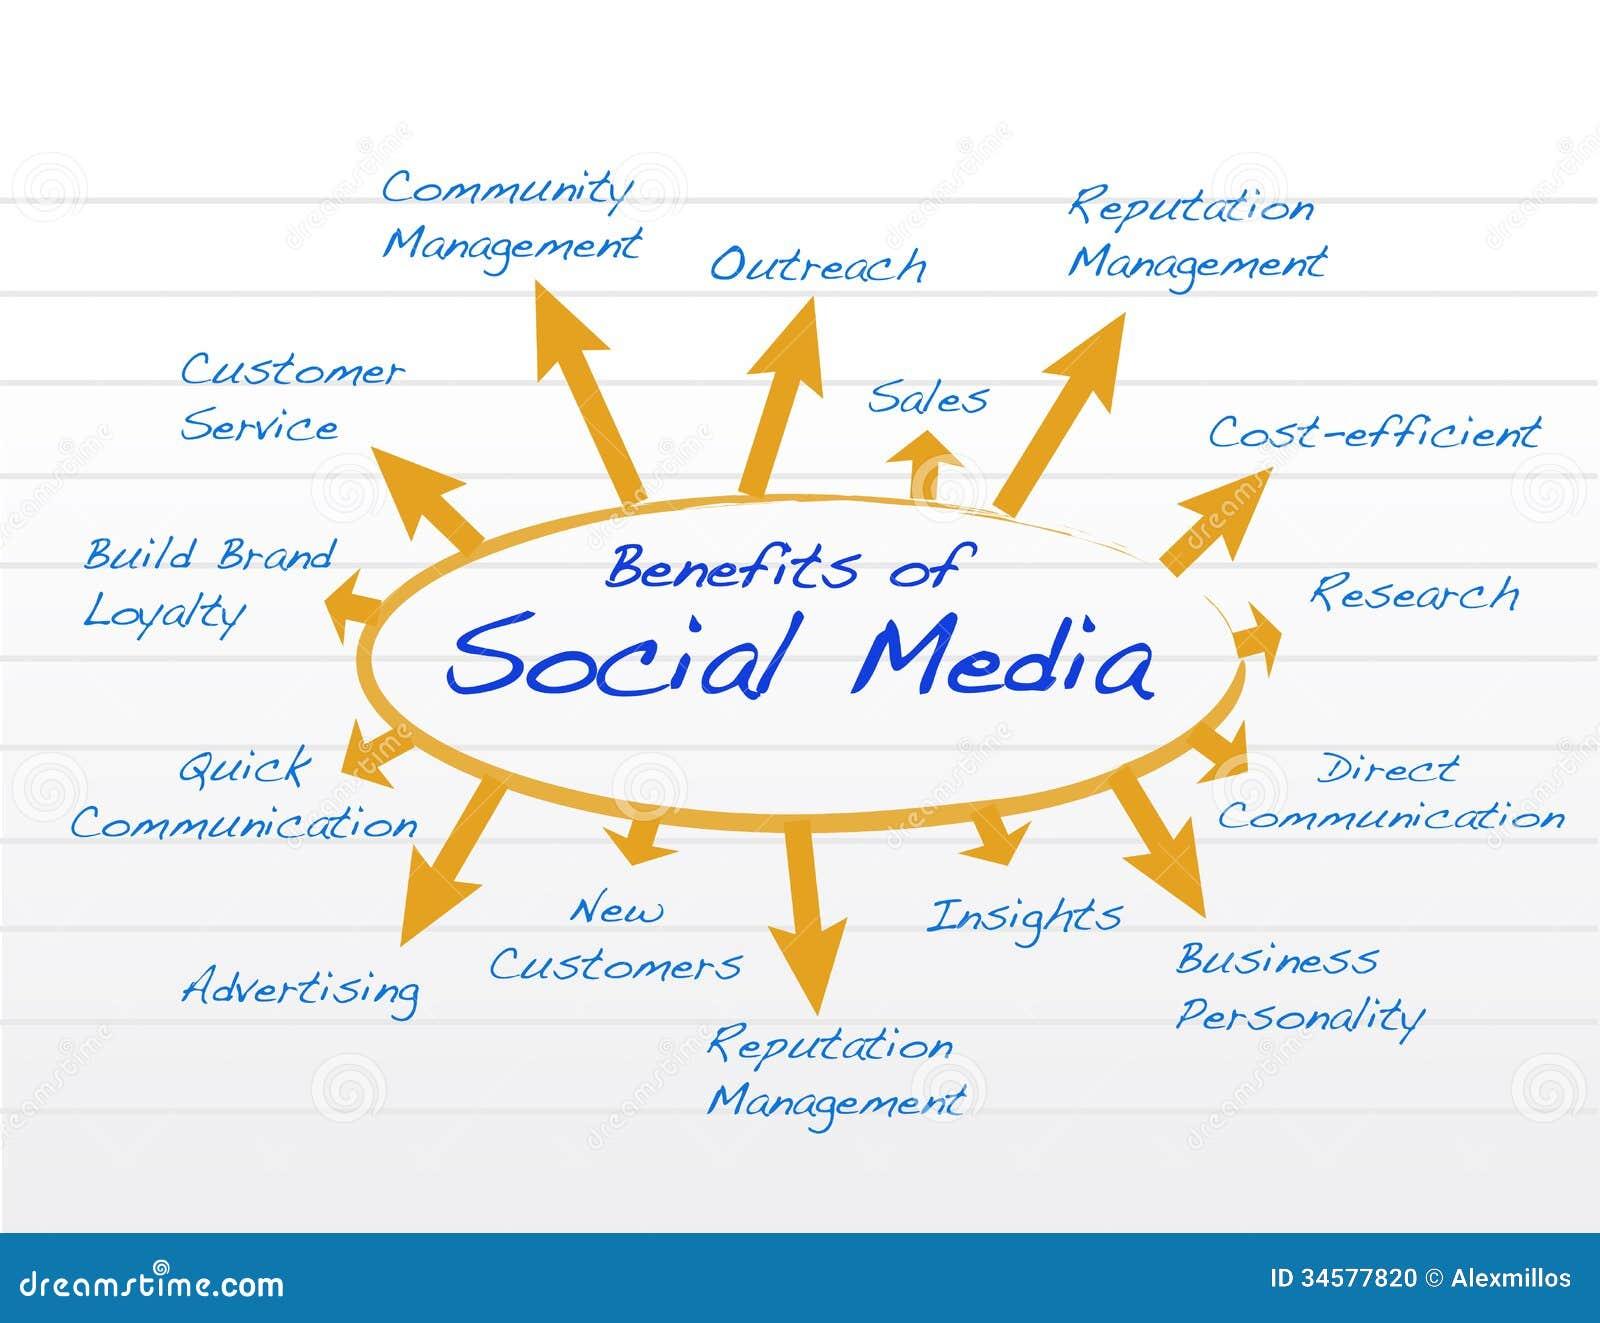 Social Media Benefits Diagram Model Illustration Stock